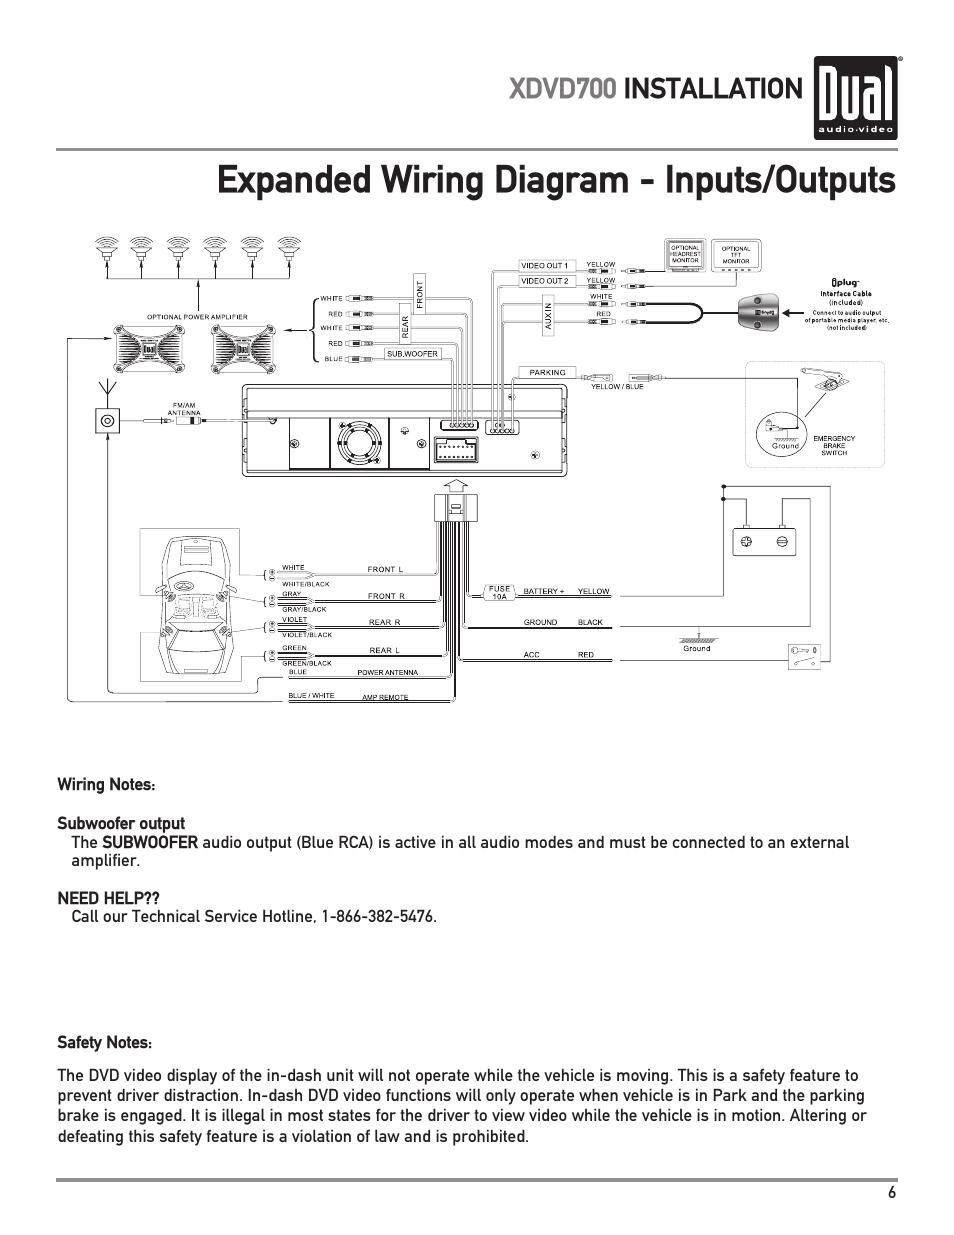 Dual cd770 wiring harness diagram 9 xje zionsnowboards de \u2022 dual xd250 cd player with auxiliary input and usb charging dual cd770 wiring harness diagram 1 qop paulking nl u2022 rh 1 qop paulking nl digital